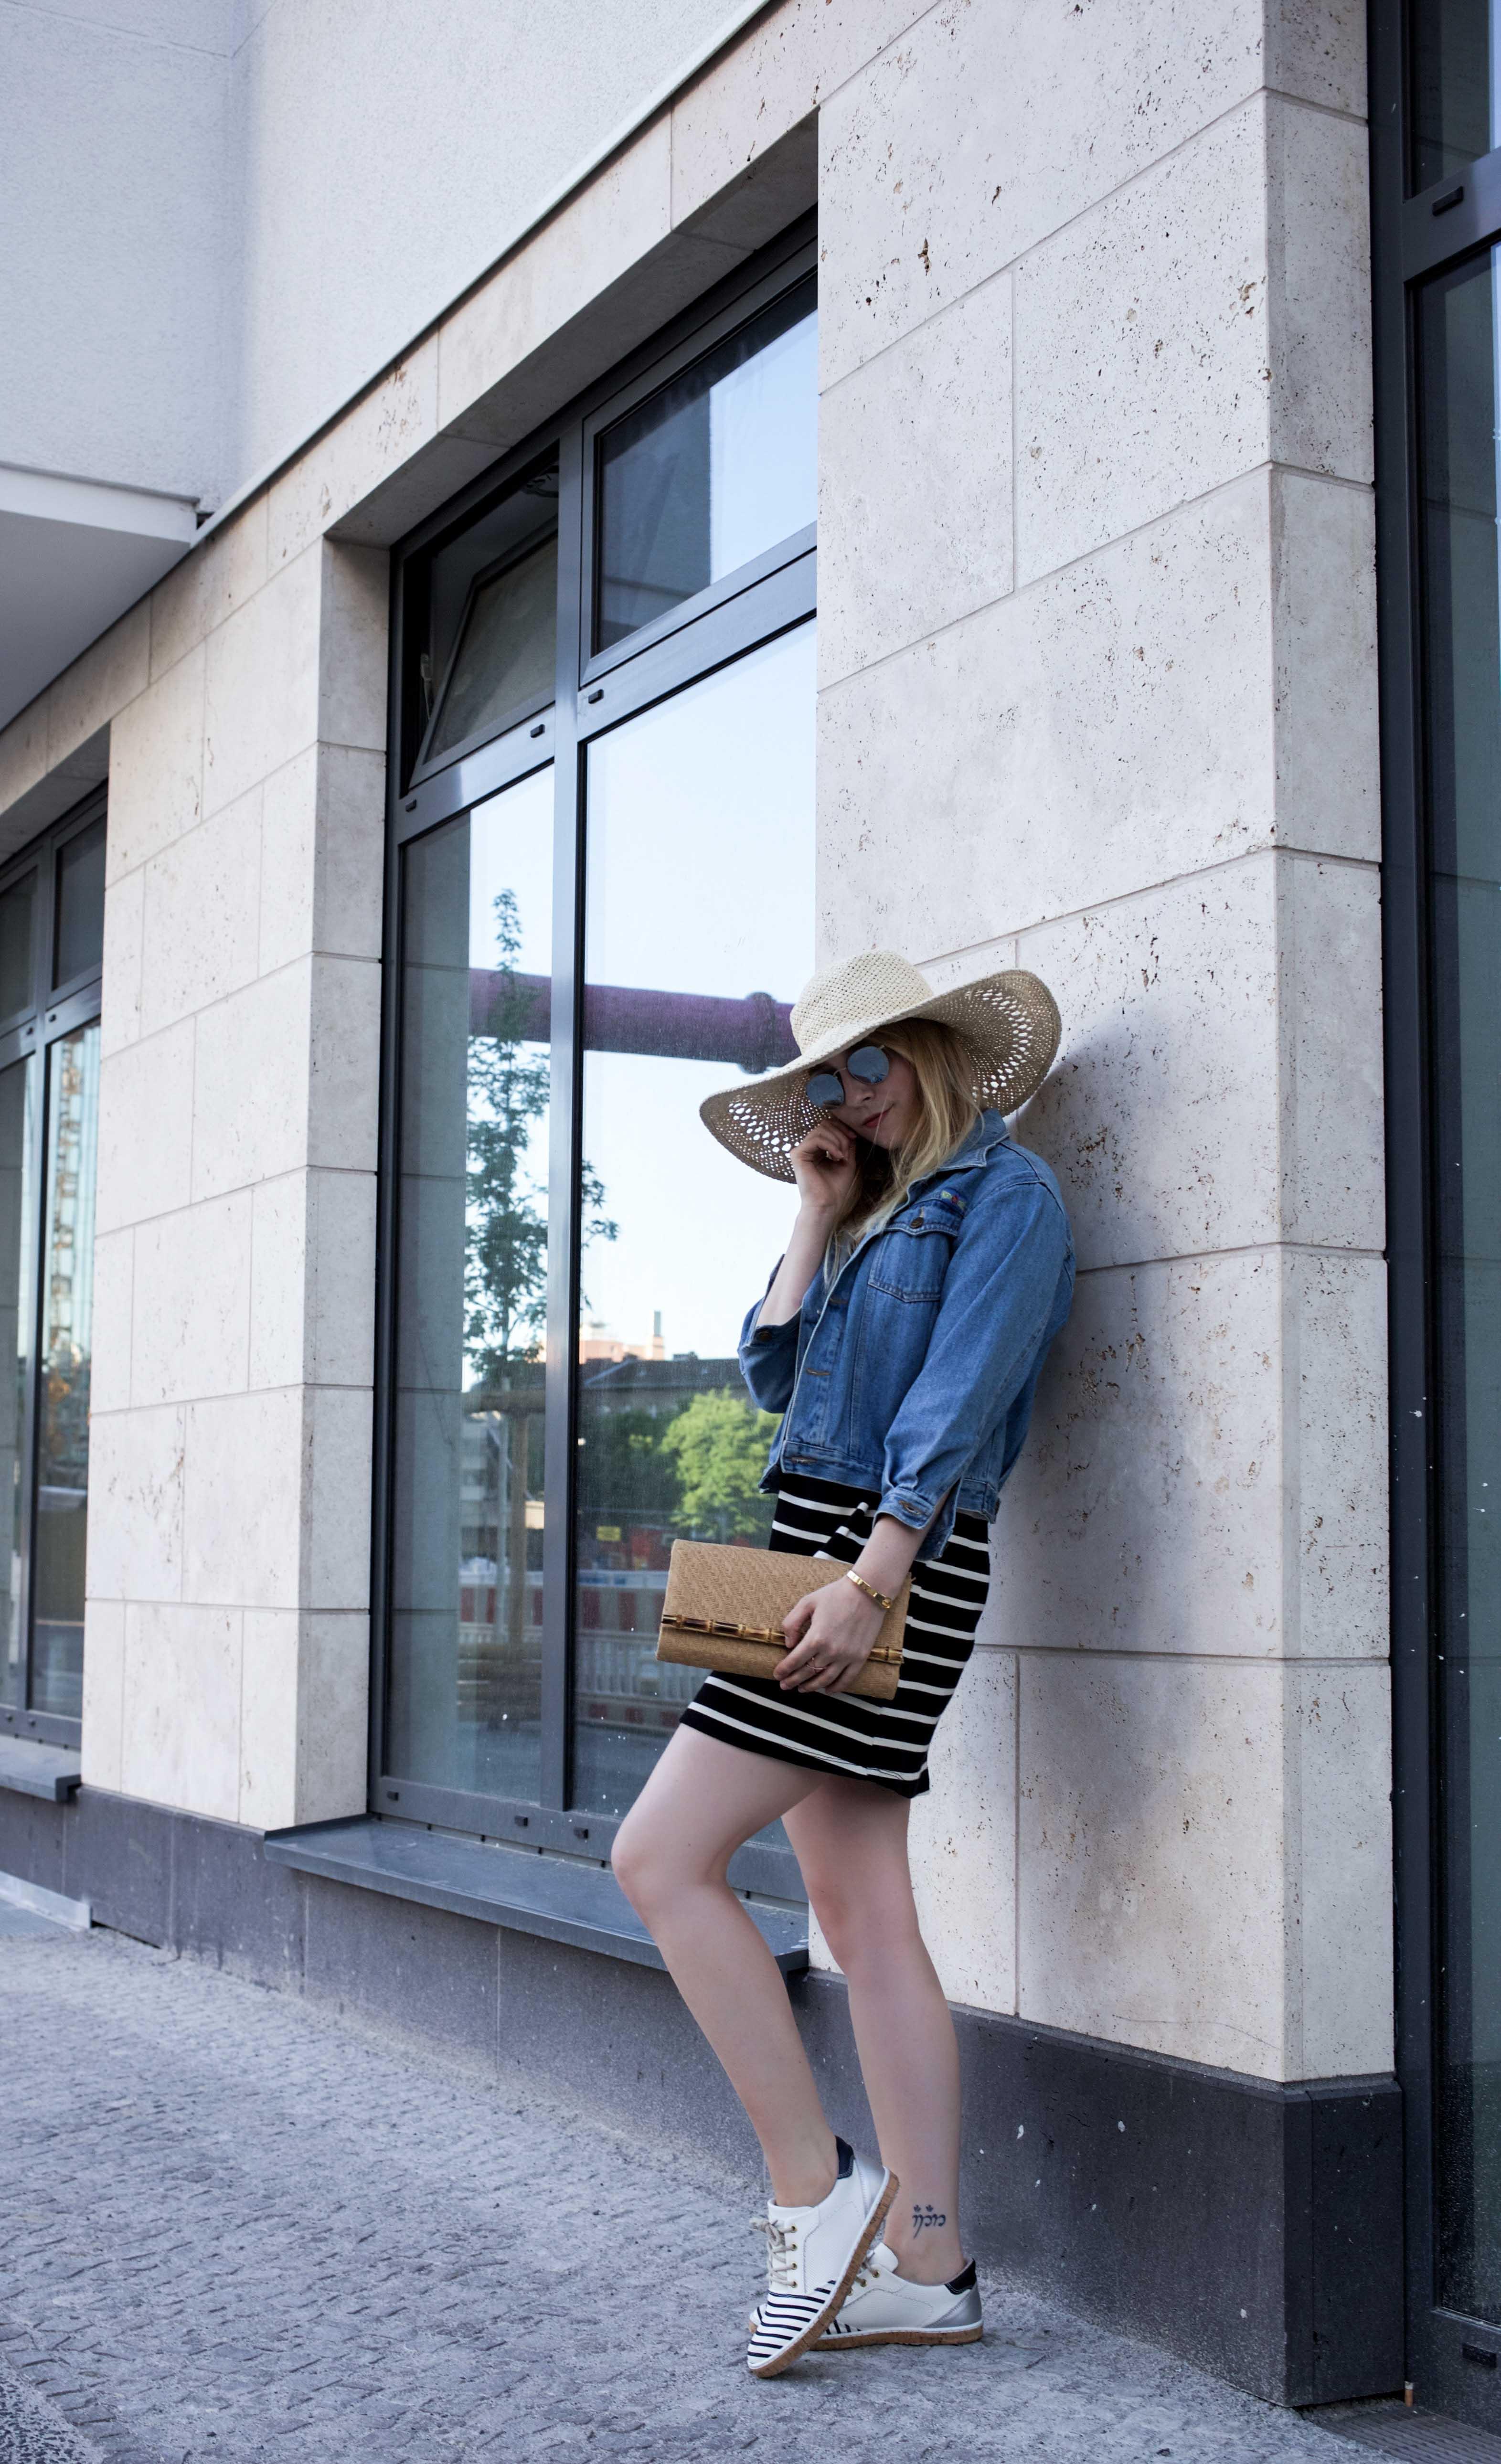 modeblog-fashionblog-berlin-köln-cologne-sonnenhut-outfit-fashion-lifestyle-sommerlook-2